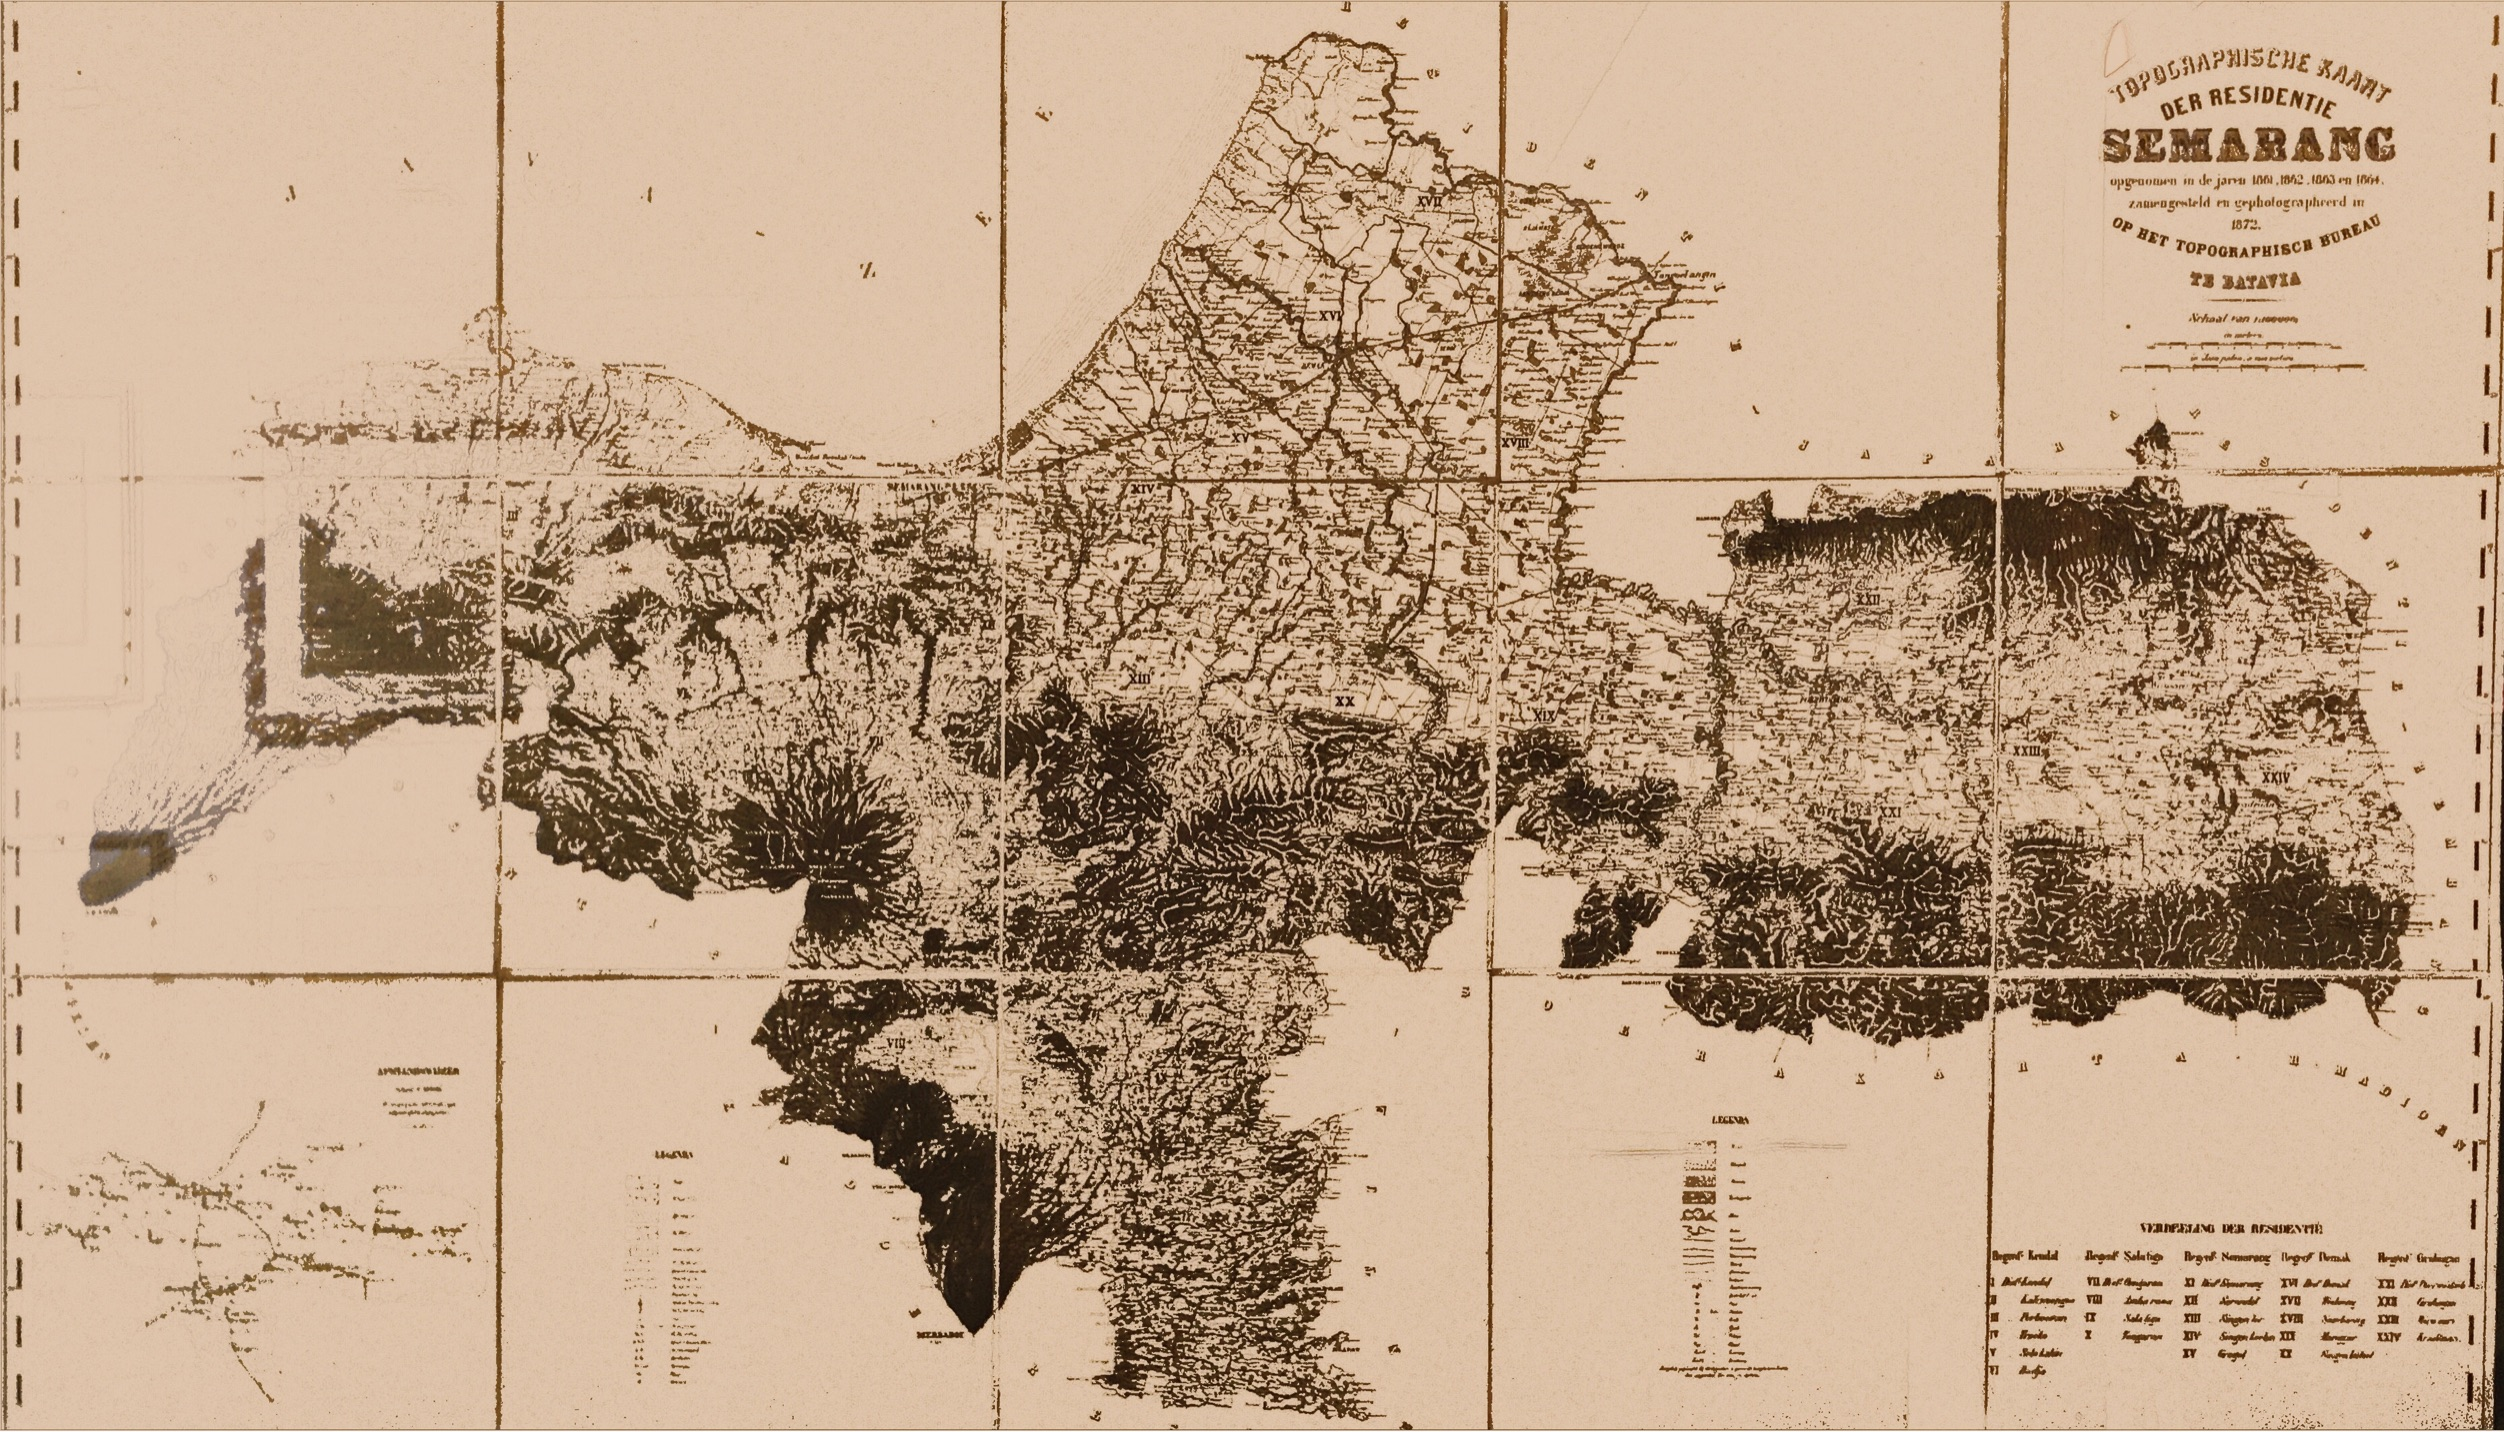 Topography Map of Semarang - Batavia Bureau (c.1872)